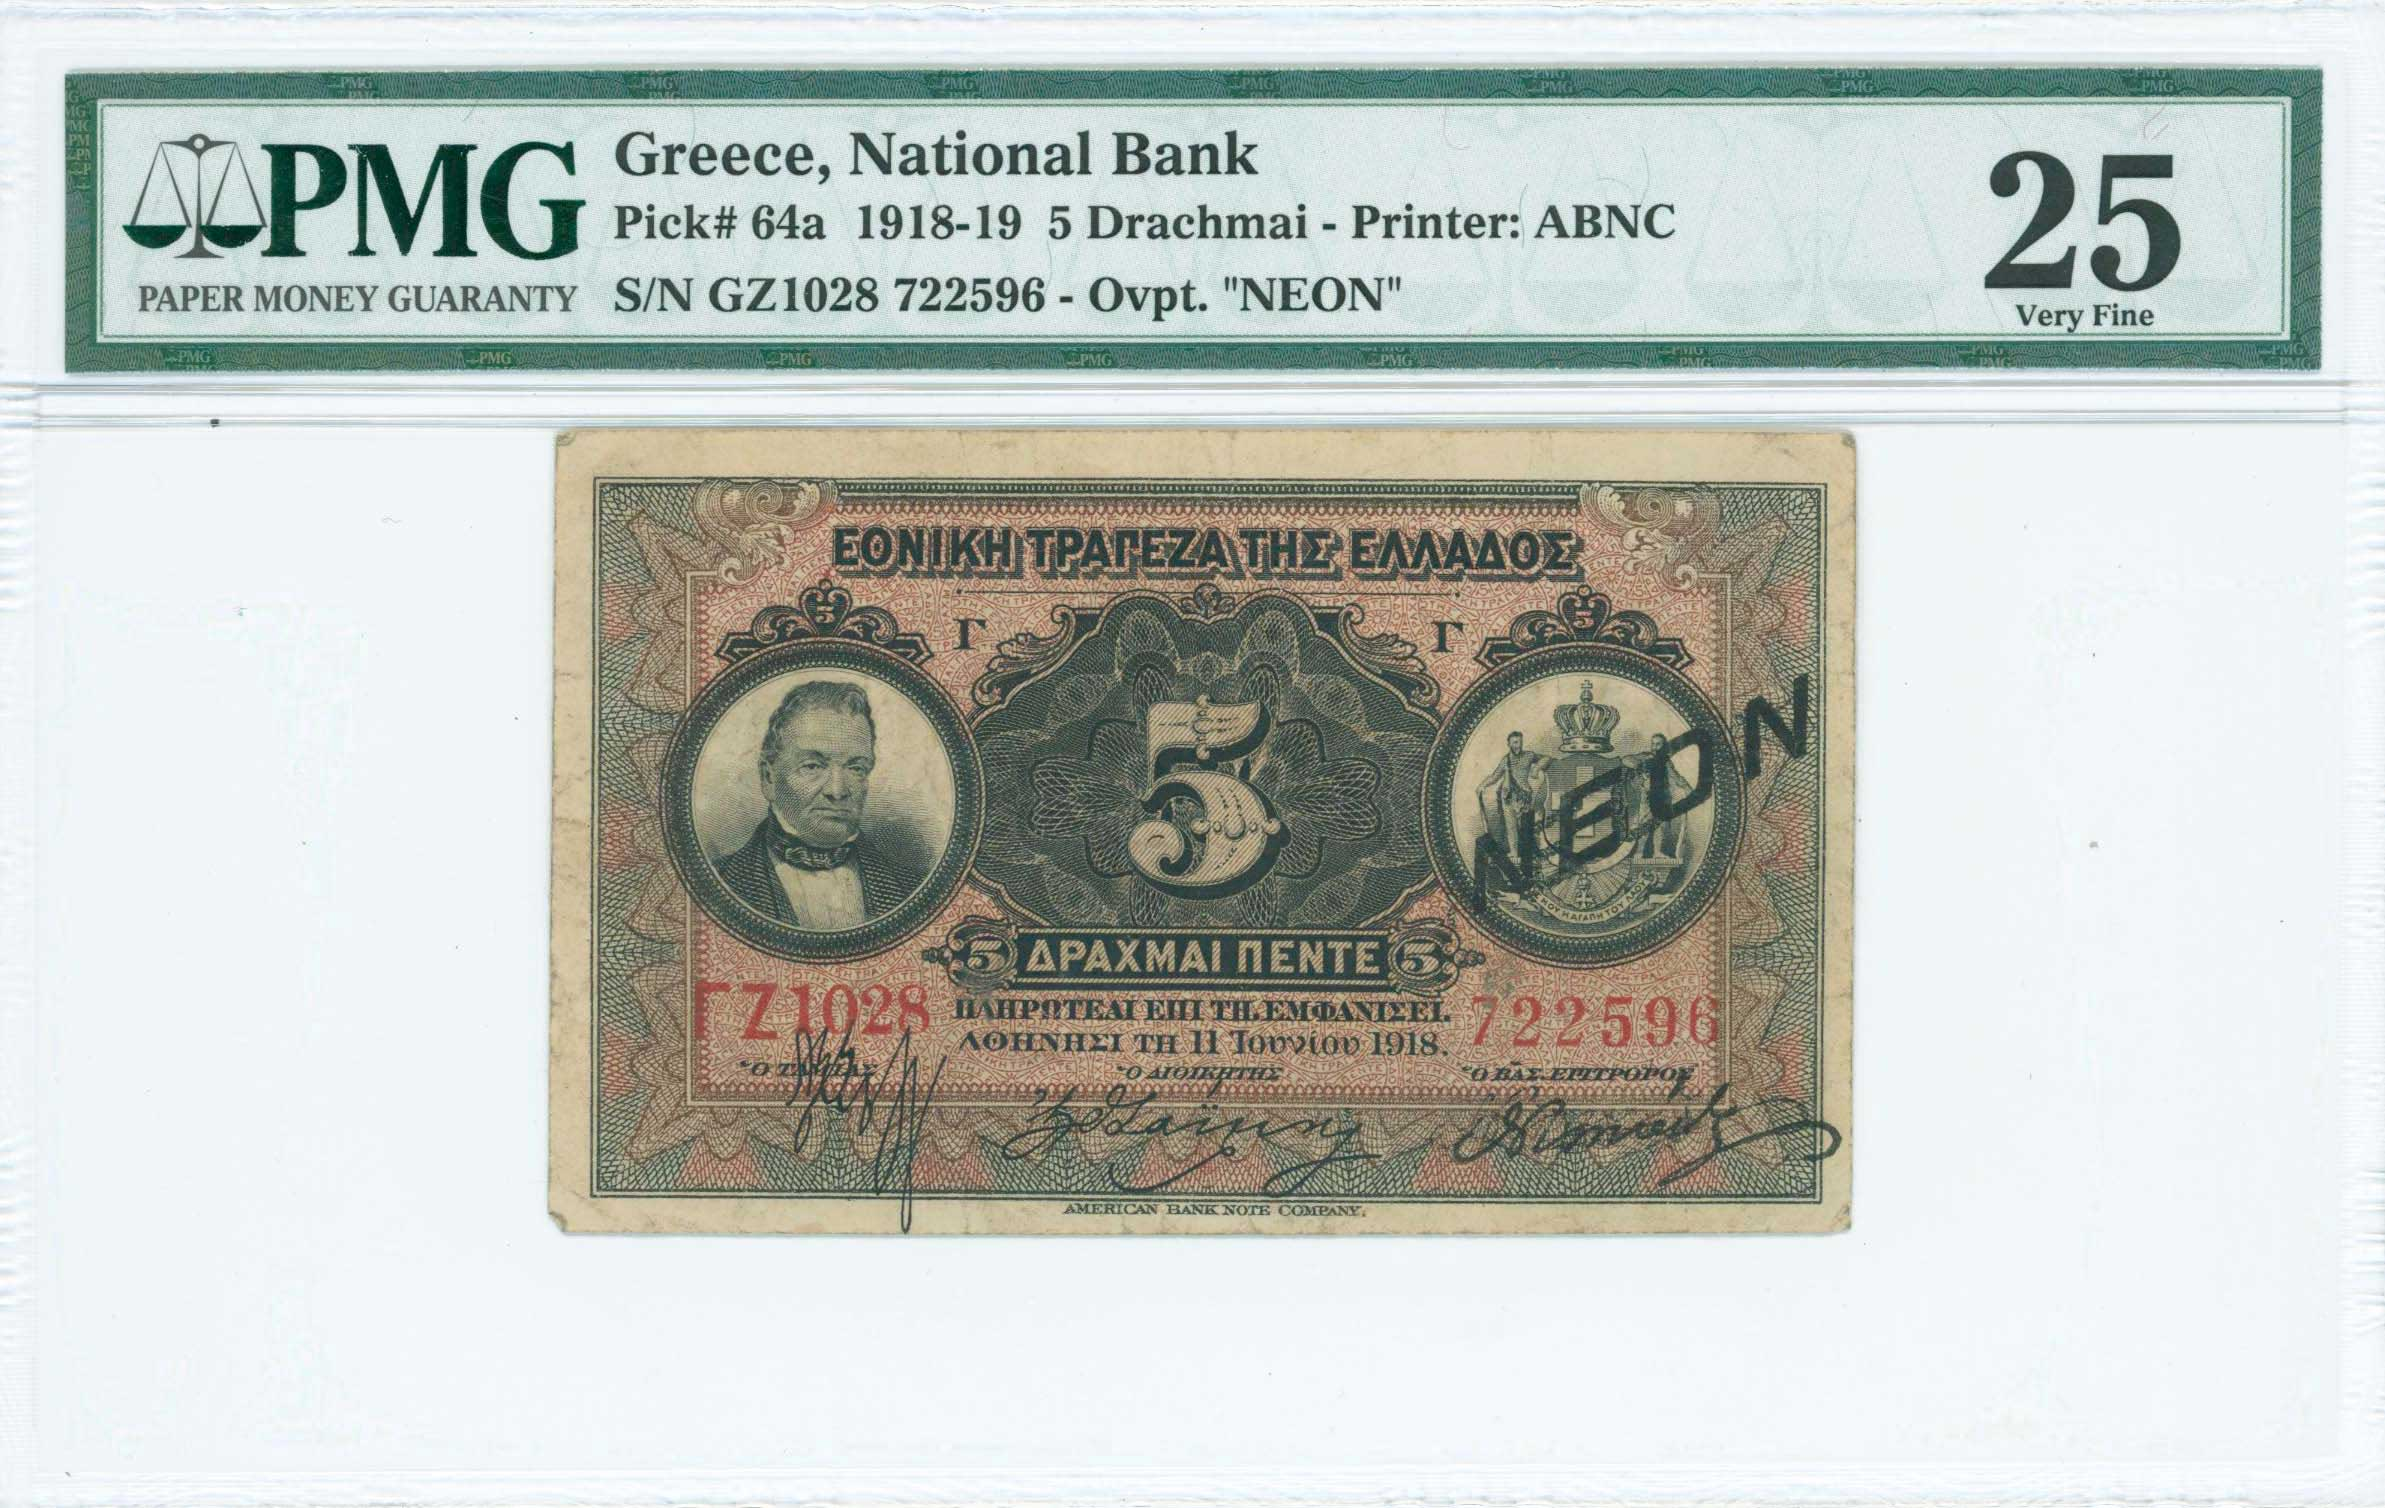 Lot 6400 - -  PAPER MONEY - BANKNOTES National Bank of Greece -  A. Karamitsos Public & Live Internet Auction 671 (Part A)